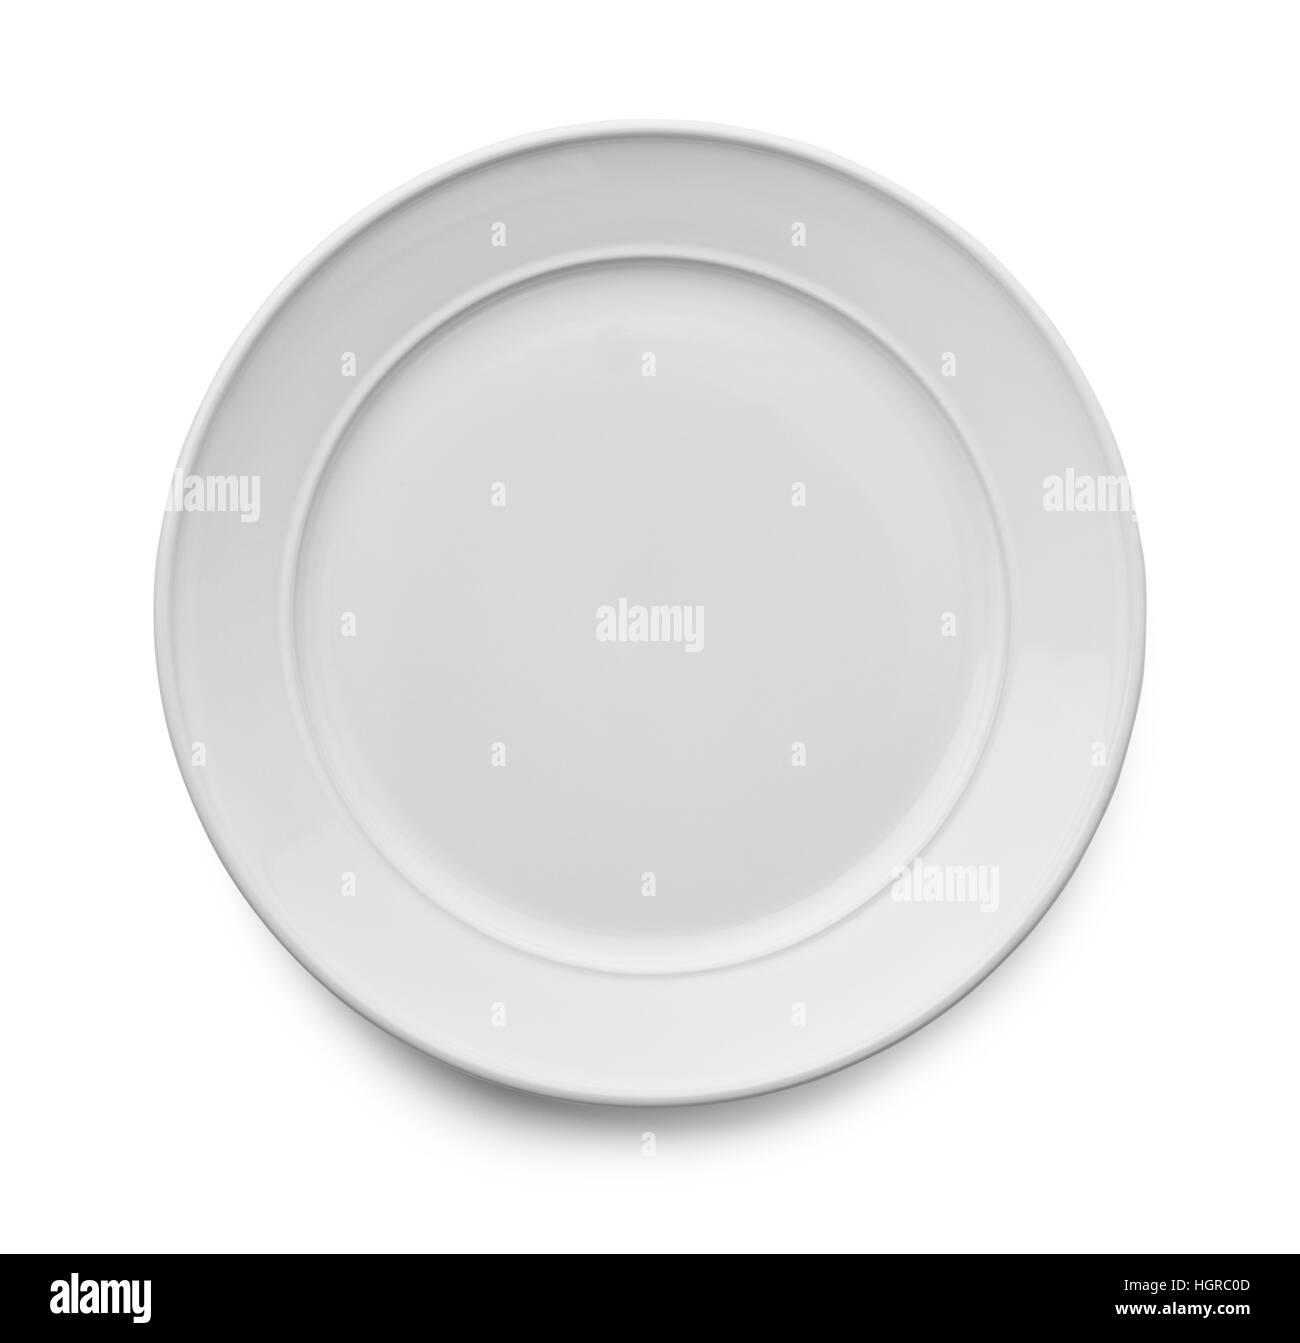 Placa cerámica blanco aislado sobre fondo blanco. Imagen De Stock